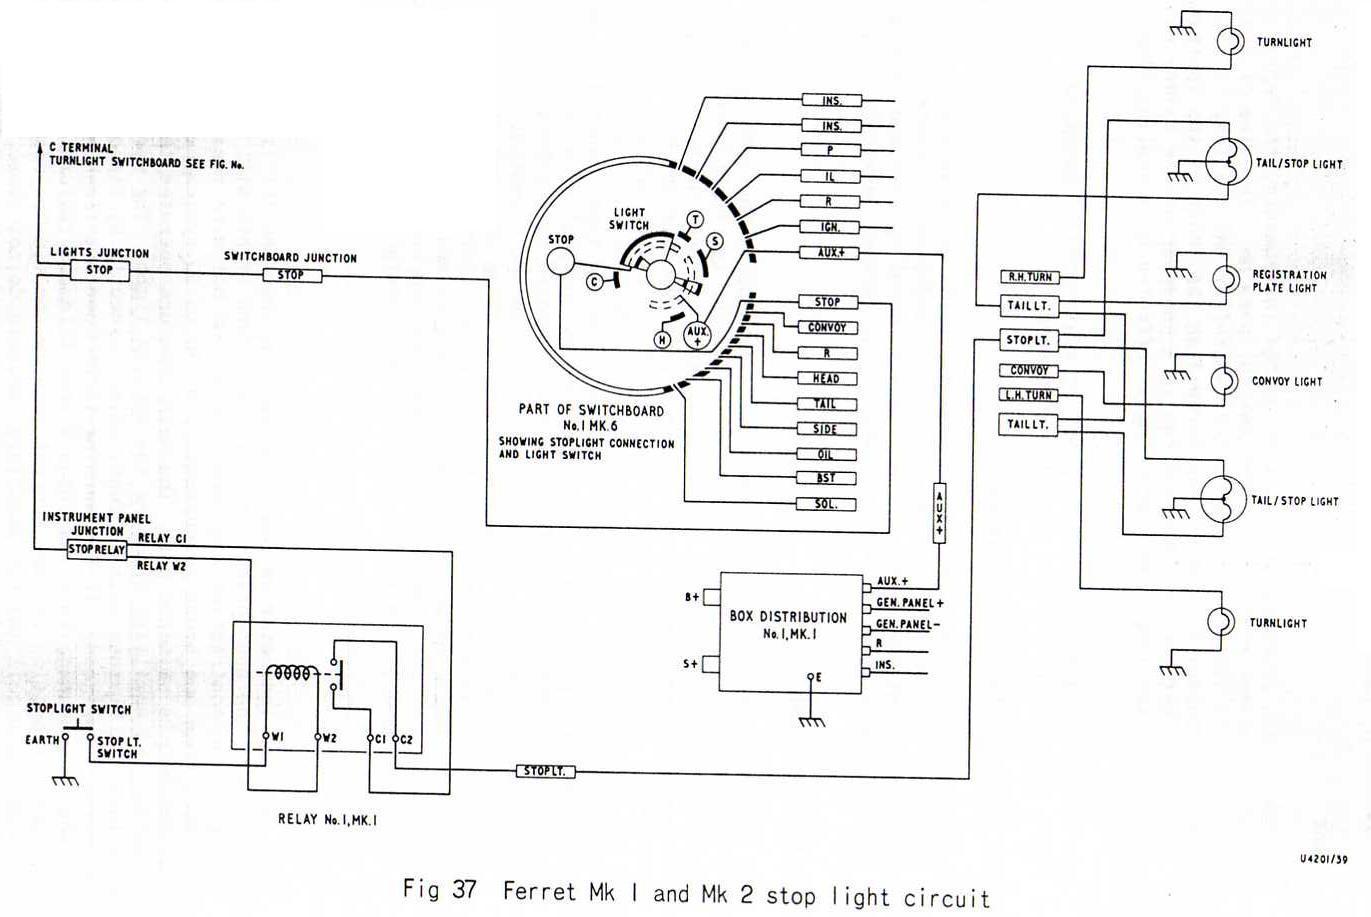 daimler ferret wiring diagram